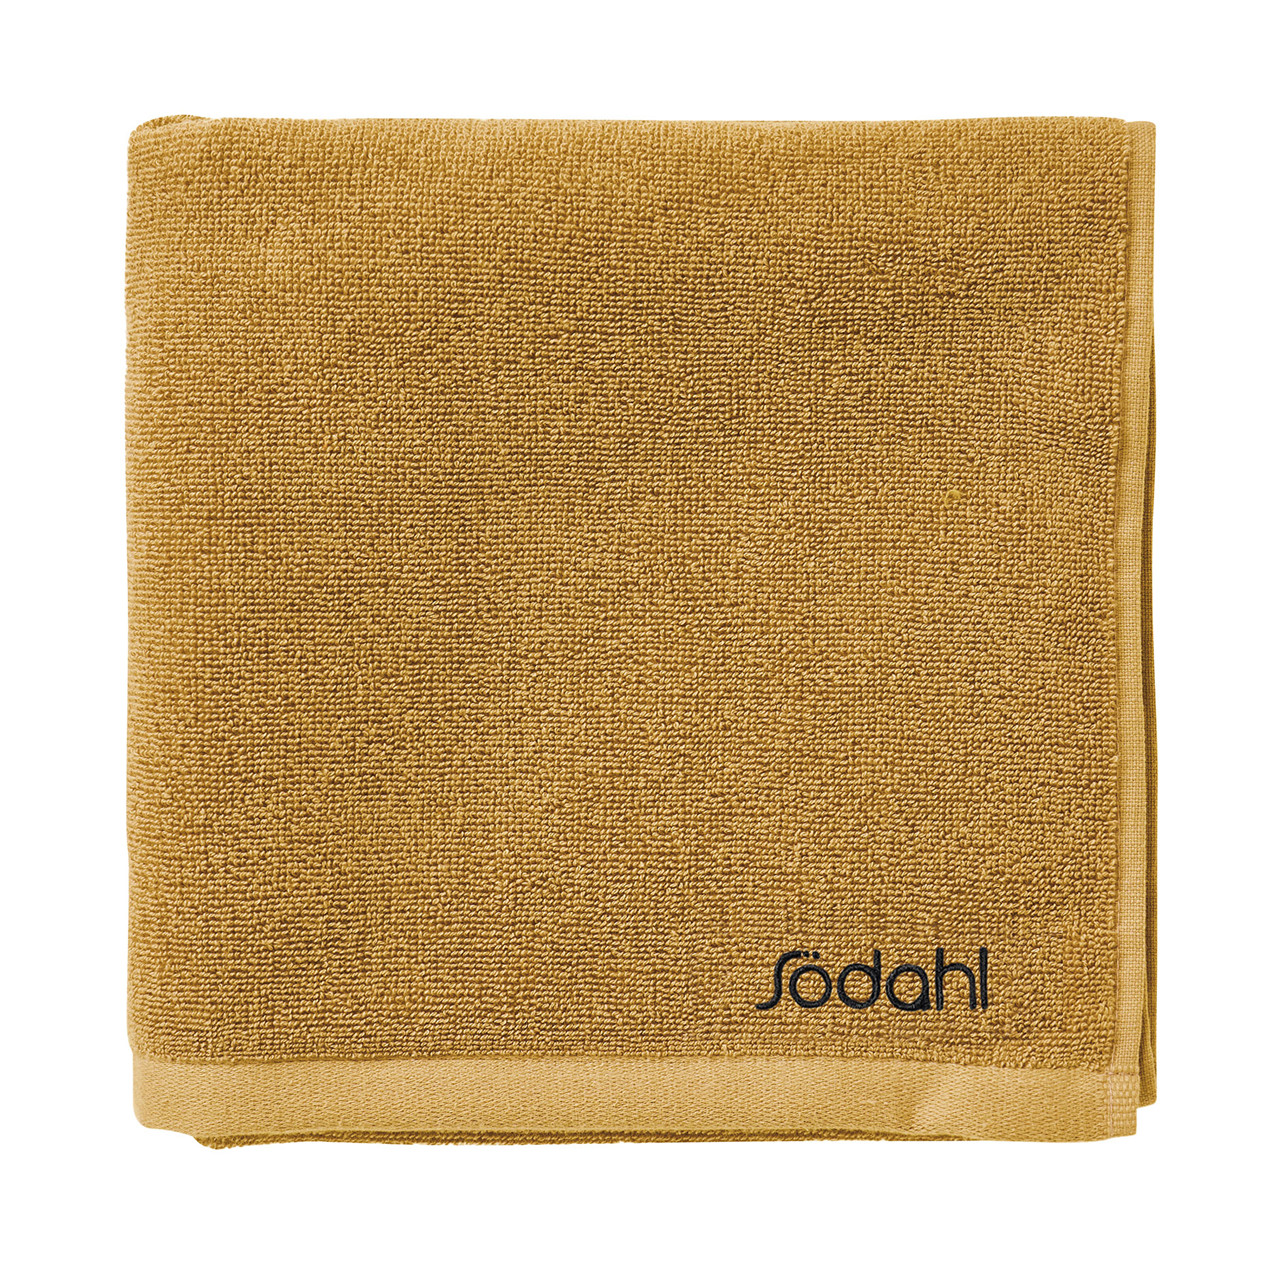 SÖDAHL Håndklæde 50x100 Fragment Gold